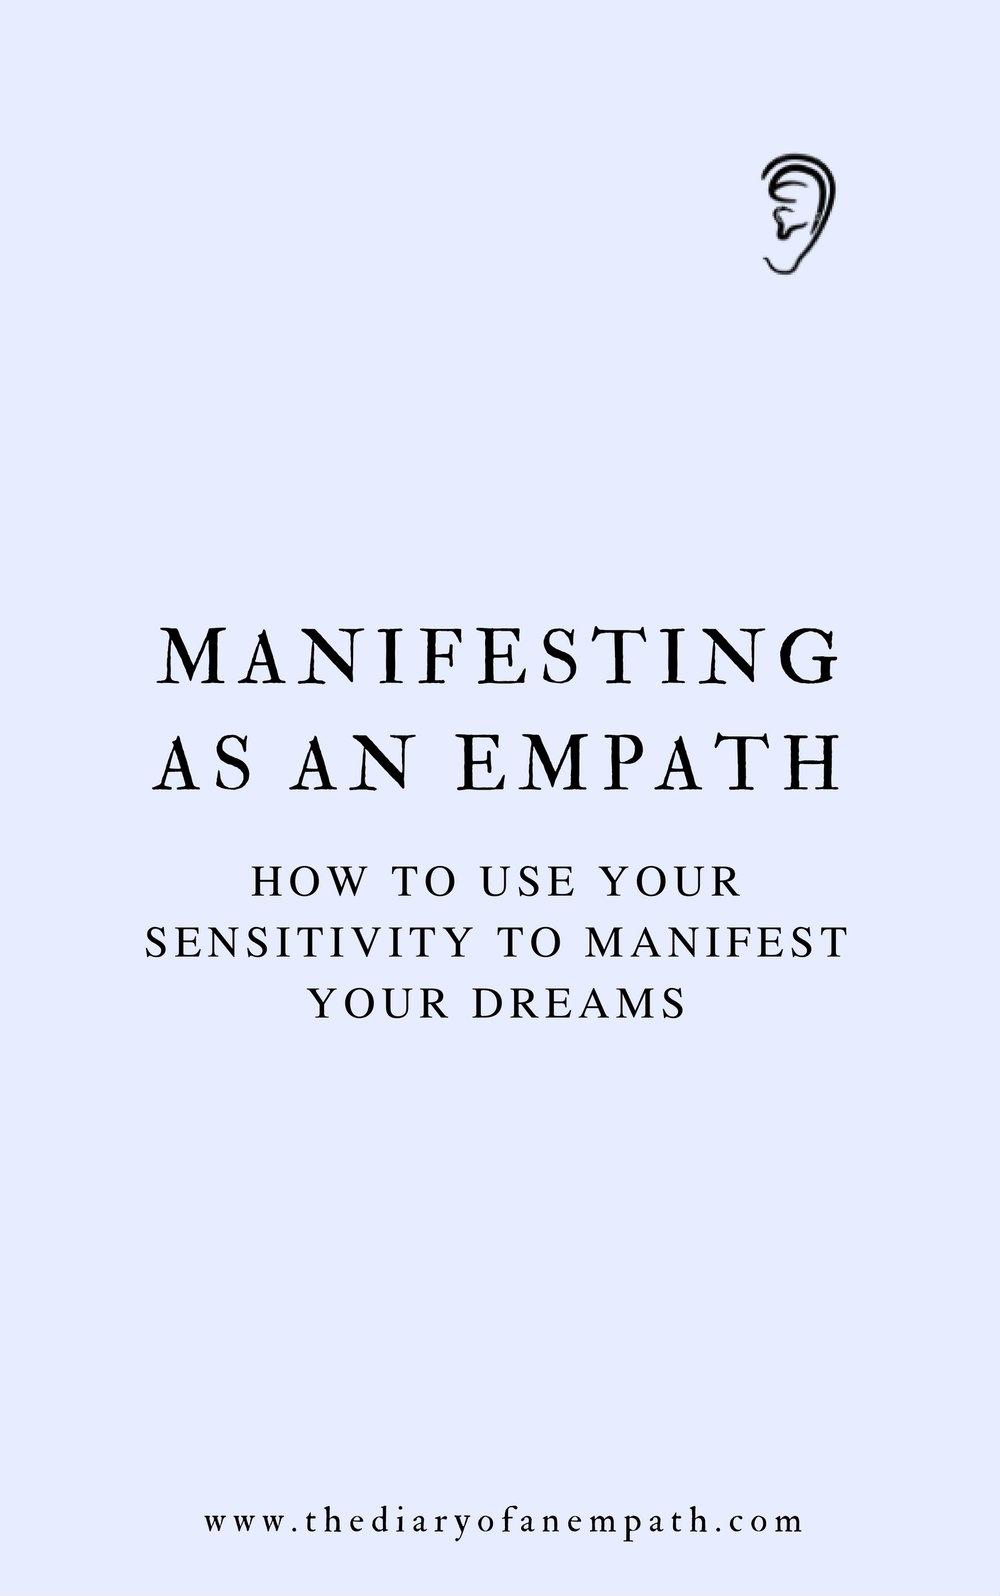 manifesting as an empath, thediaryofanempath.com